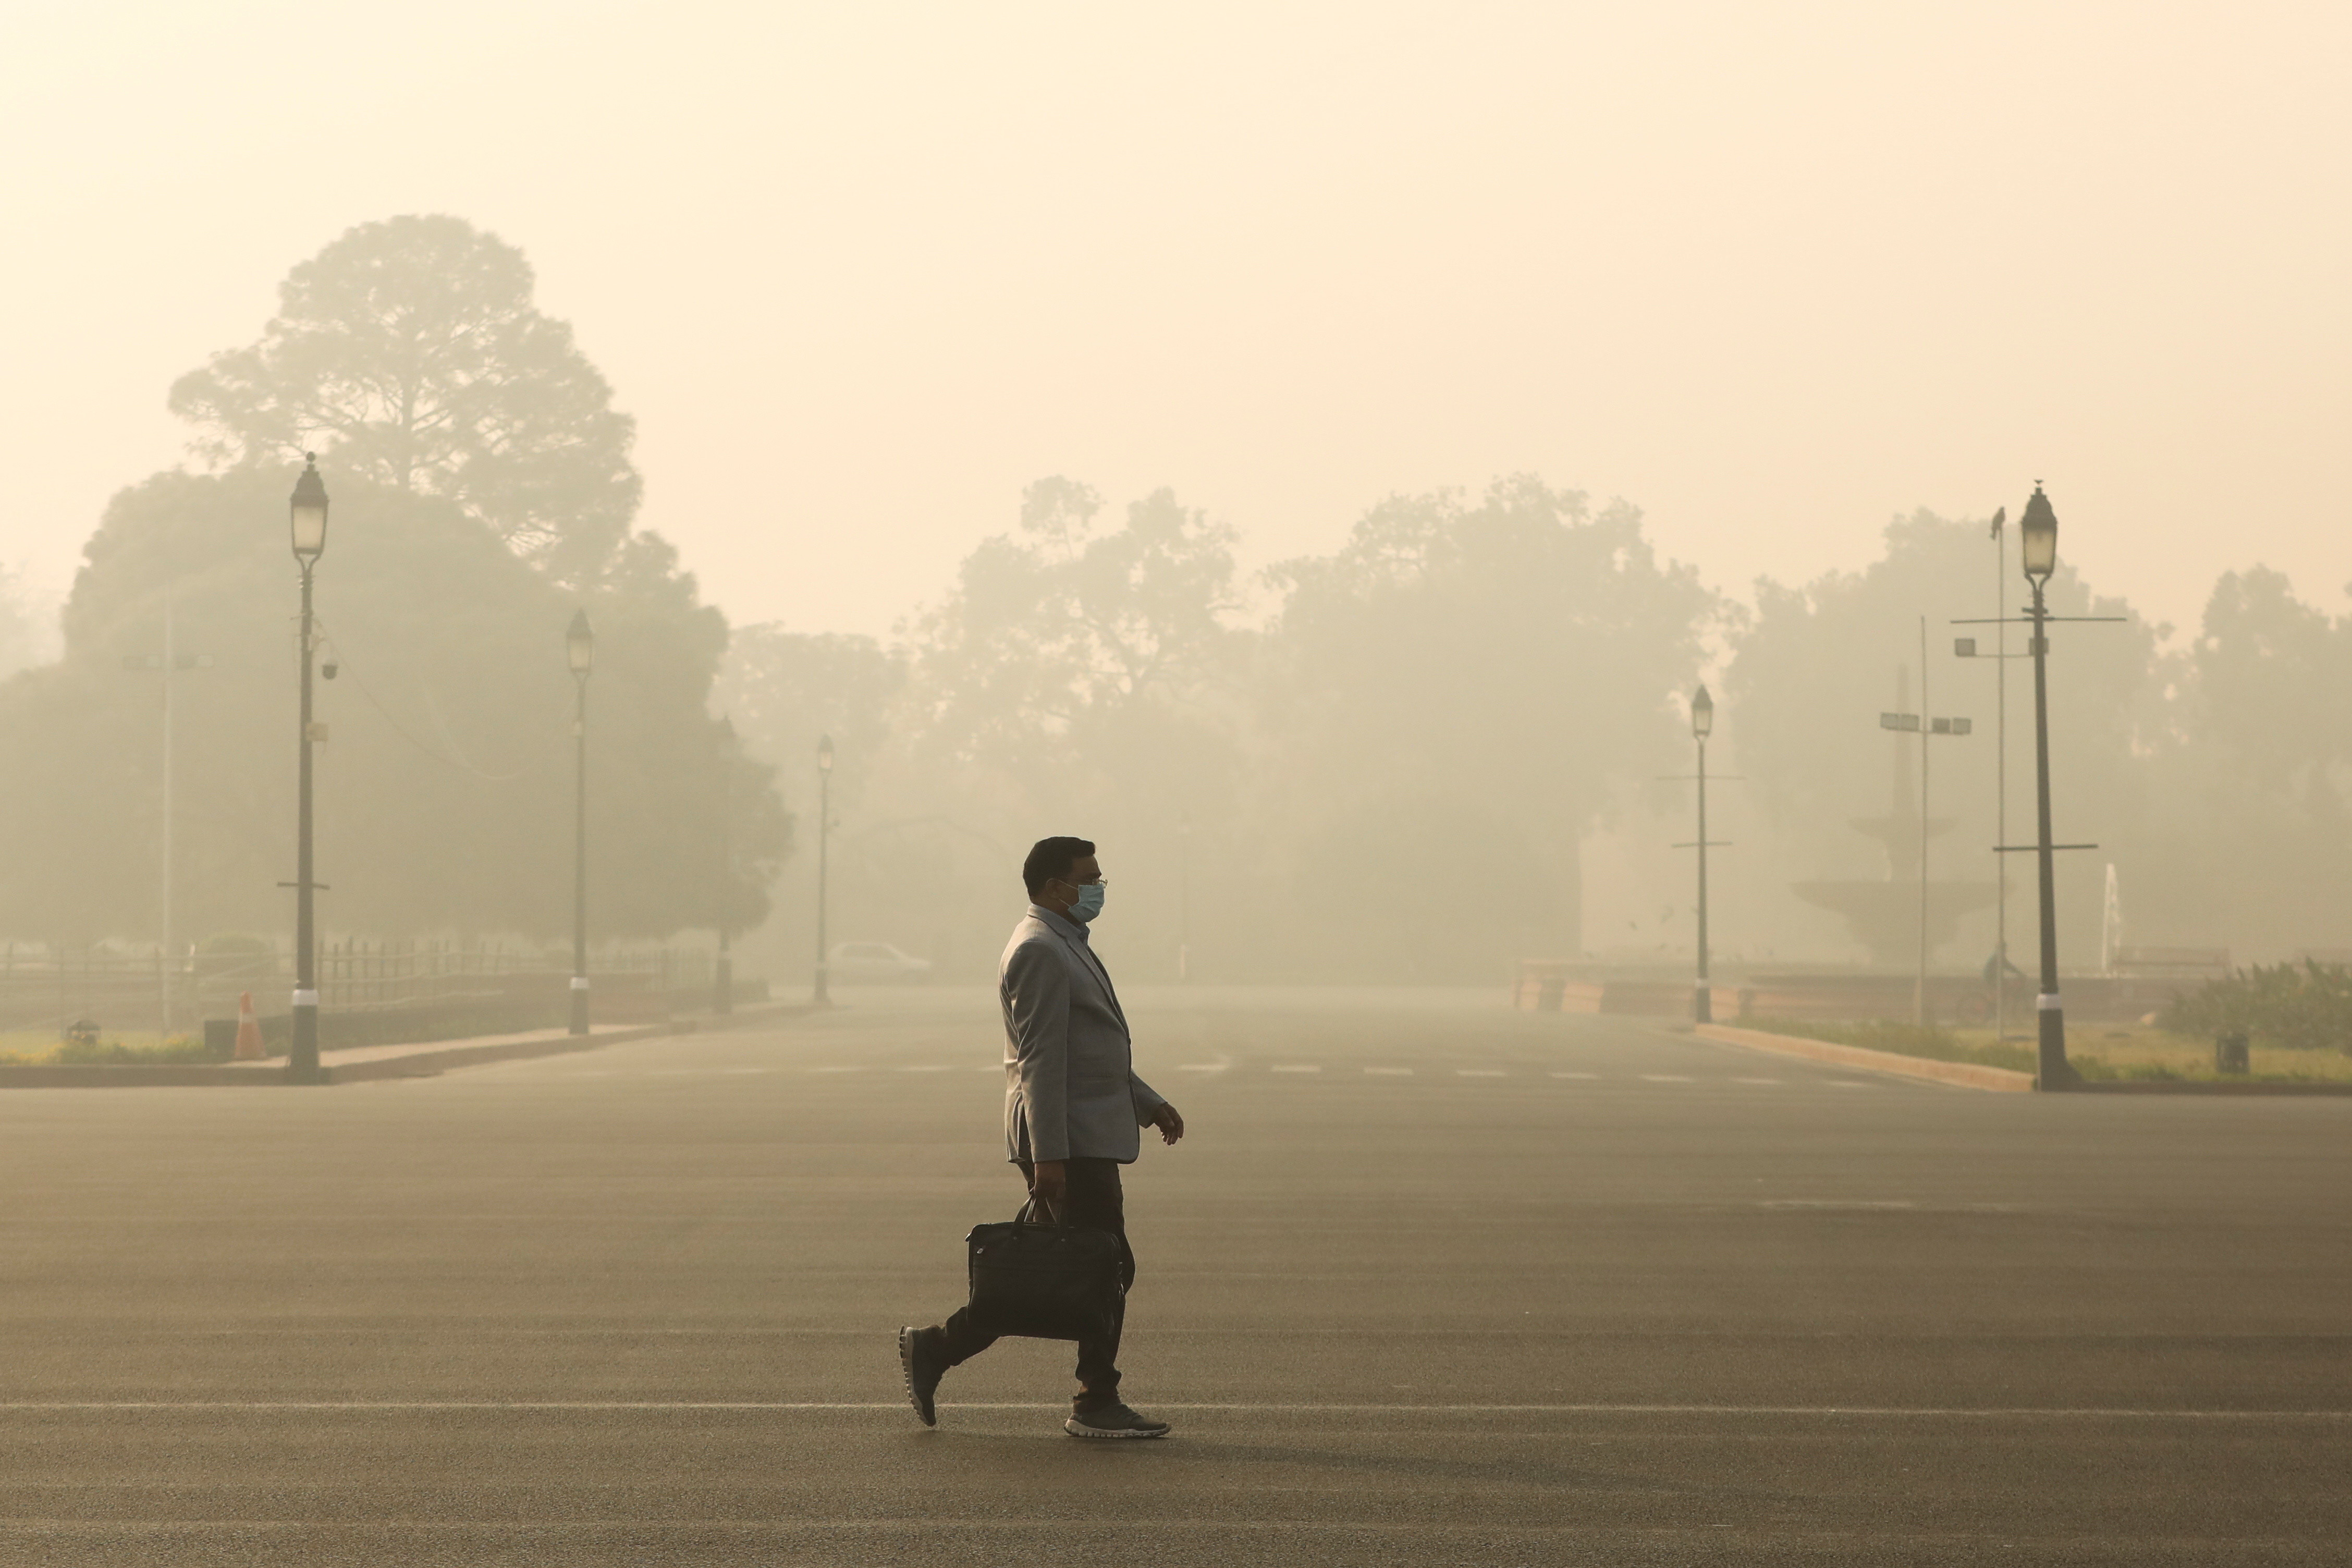 A man walks along a road on a smoggy morning in New Delhi, India, December 23, 2020. REUTERS/Anushree Fadnavis - RC2USK970CV1